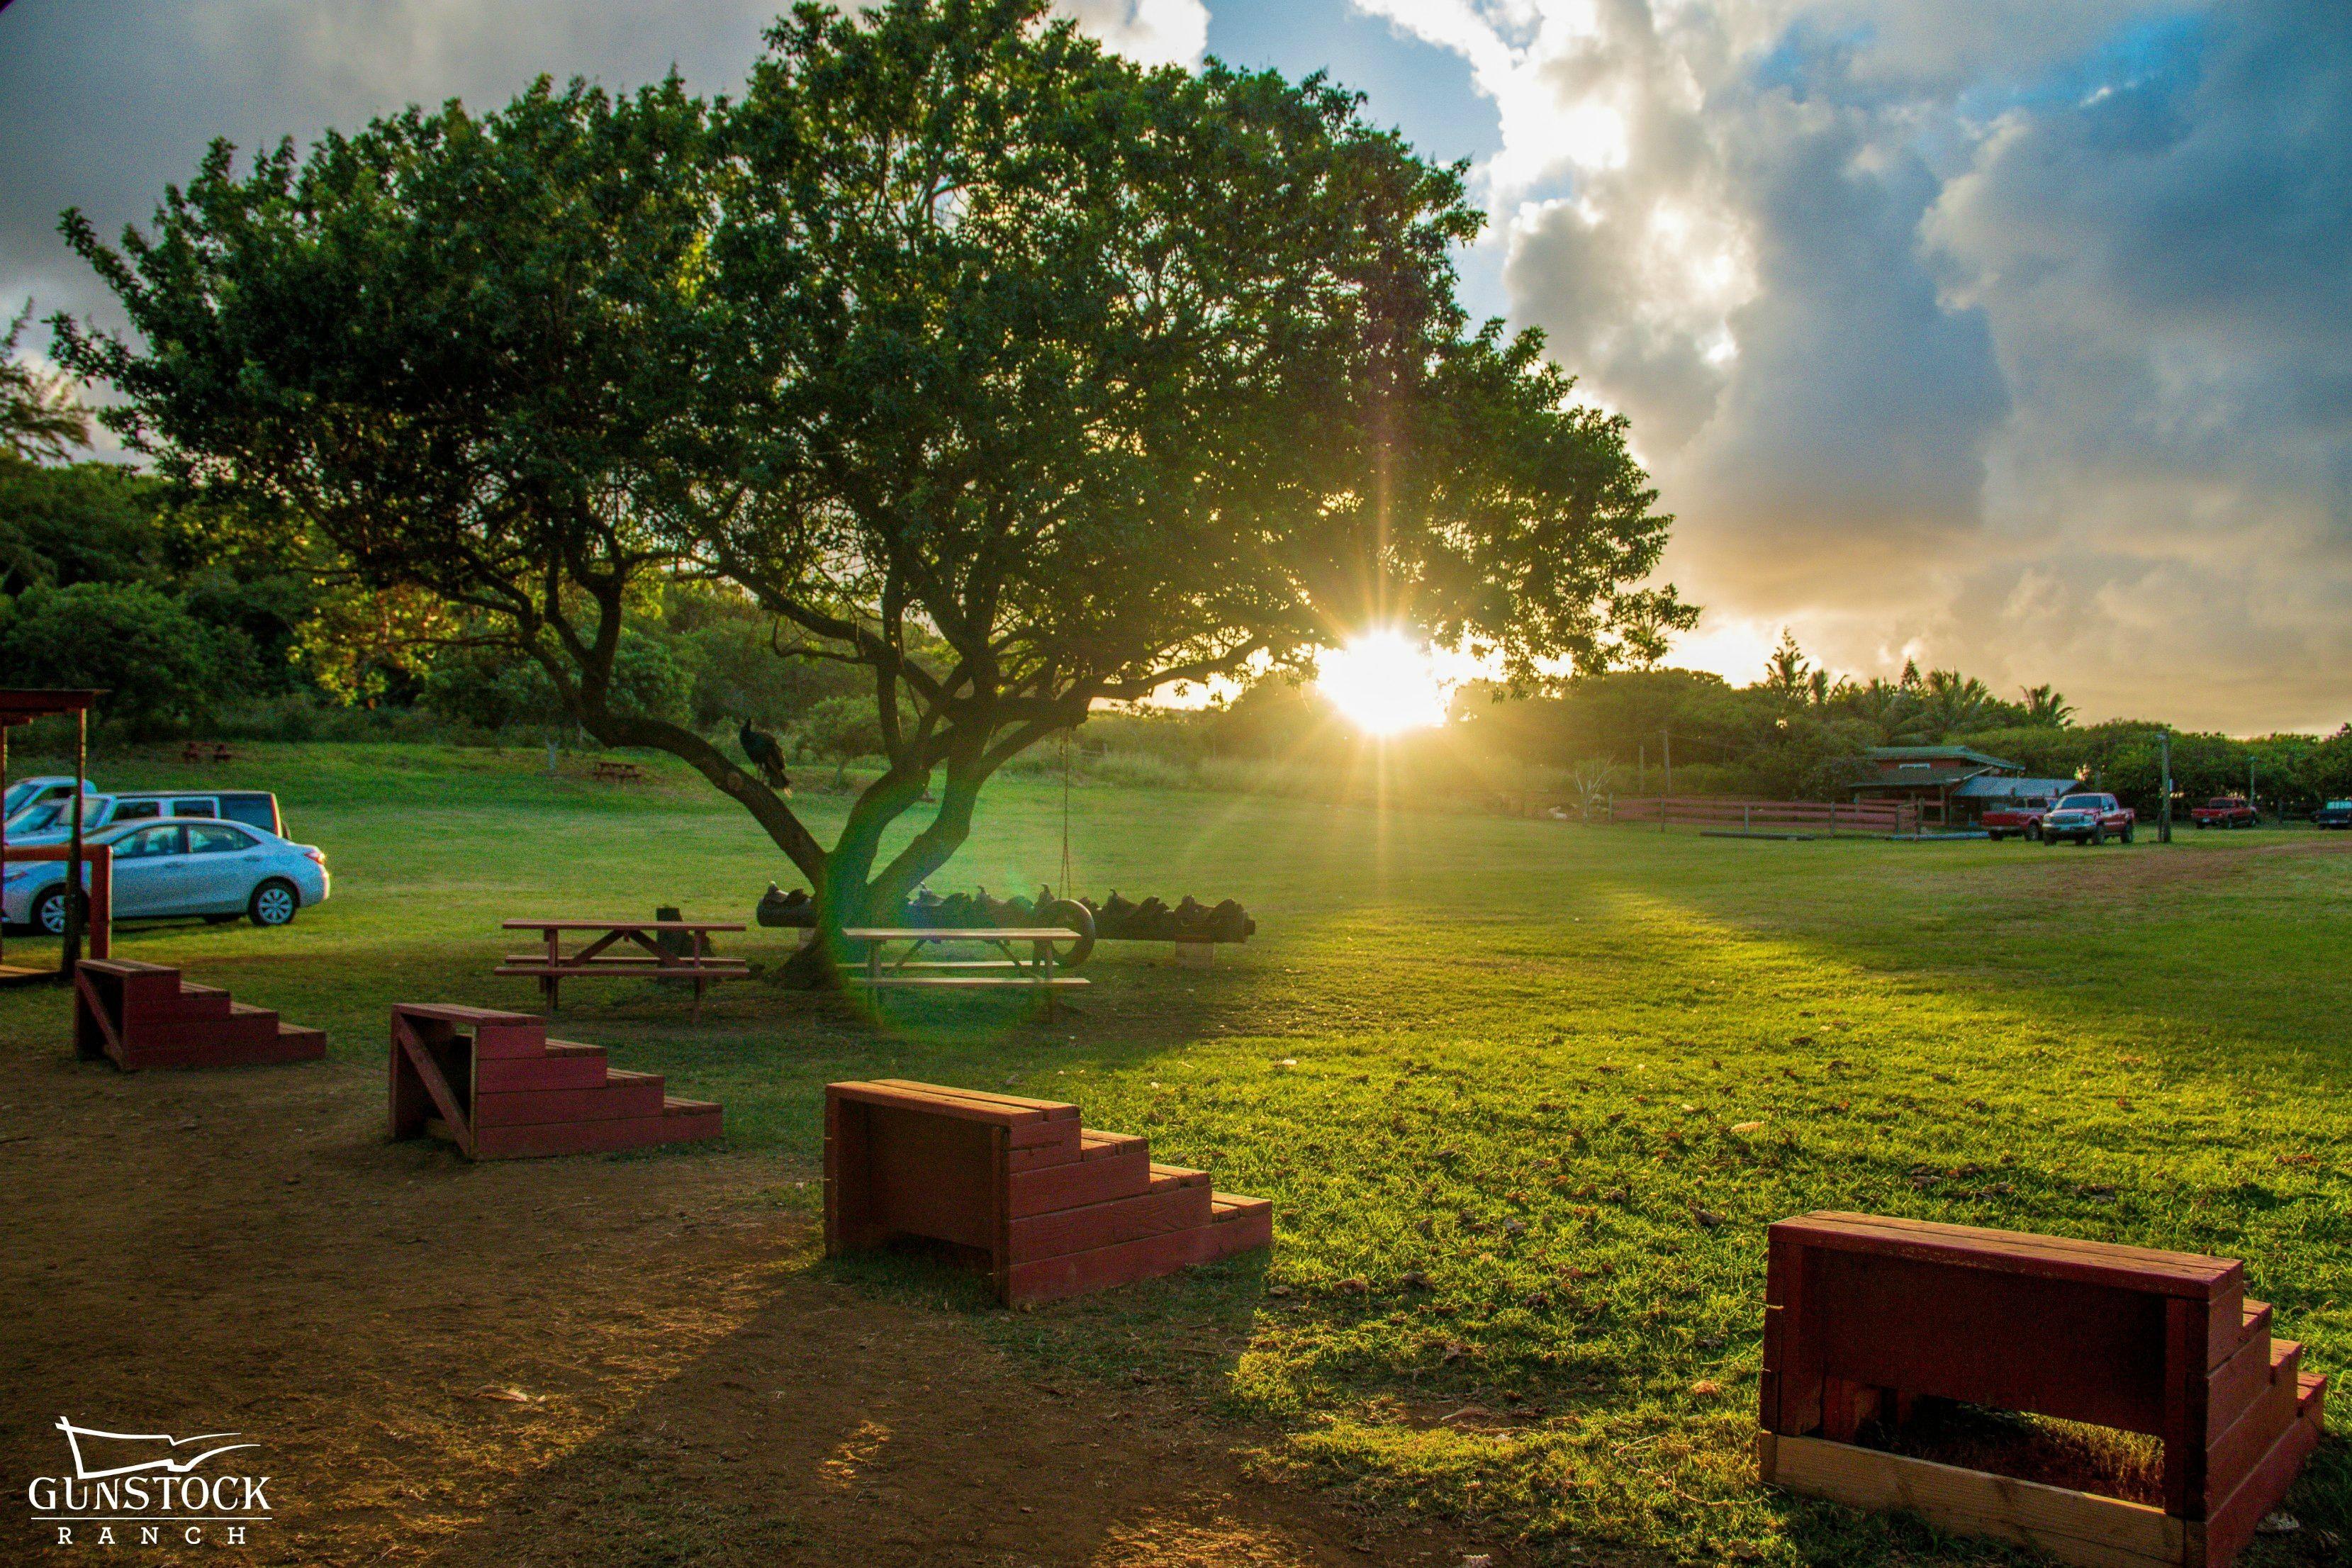 Sun poking through the trees in Gunstock ranch